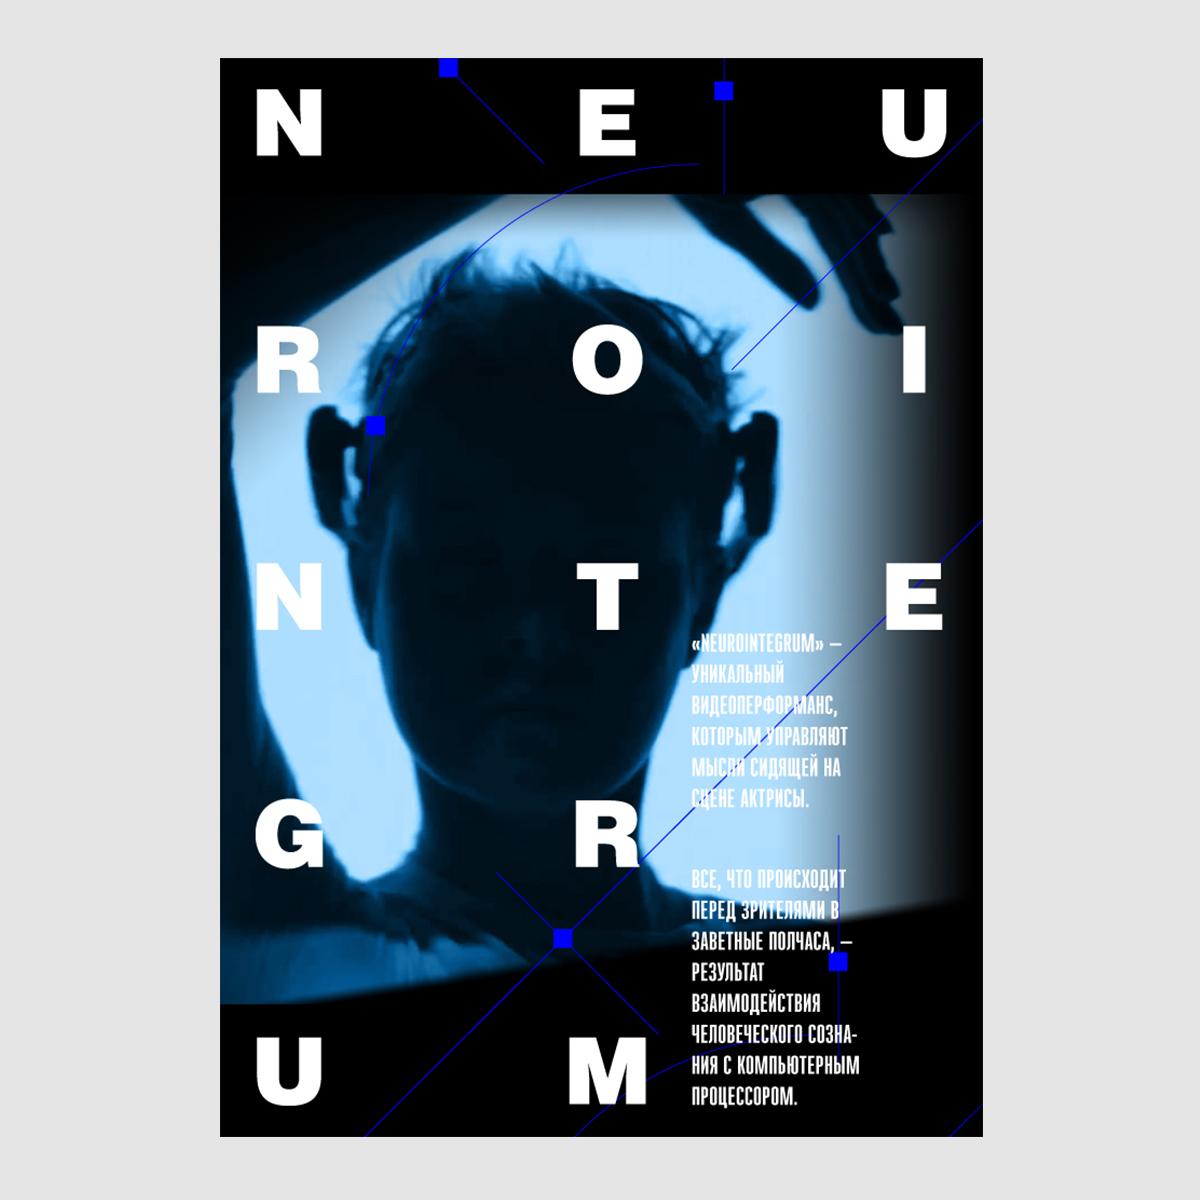 постер, neurointegrum